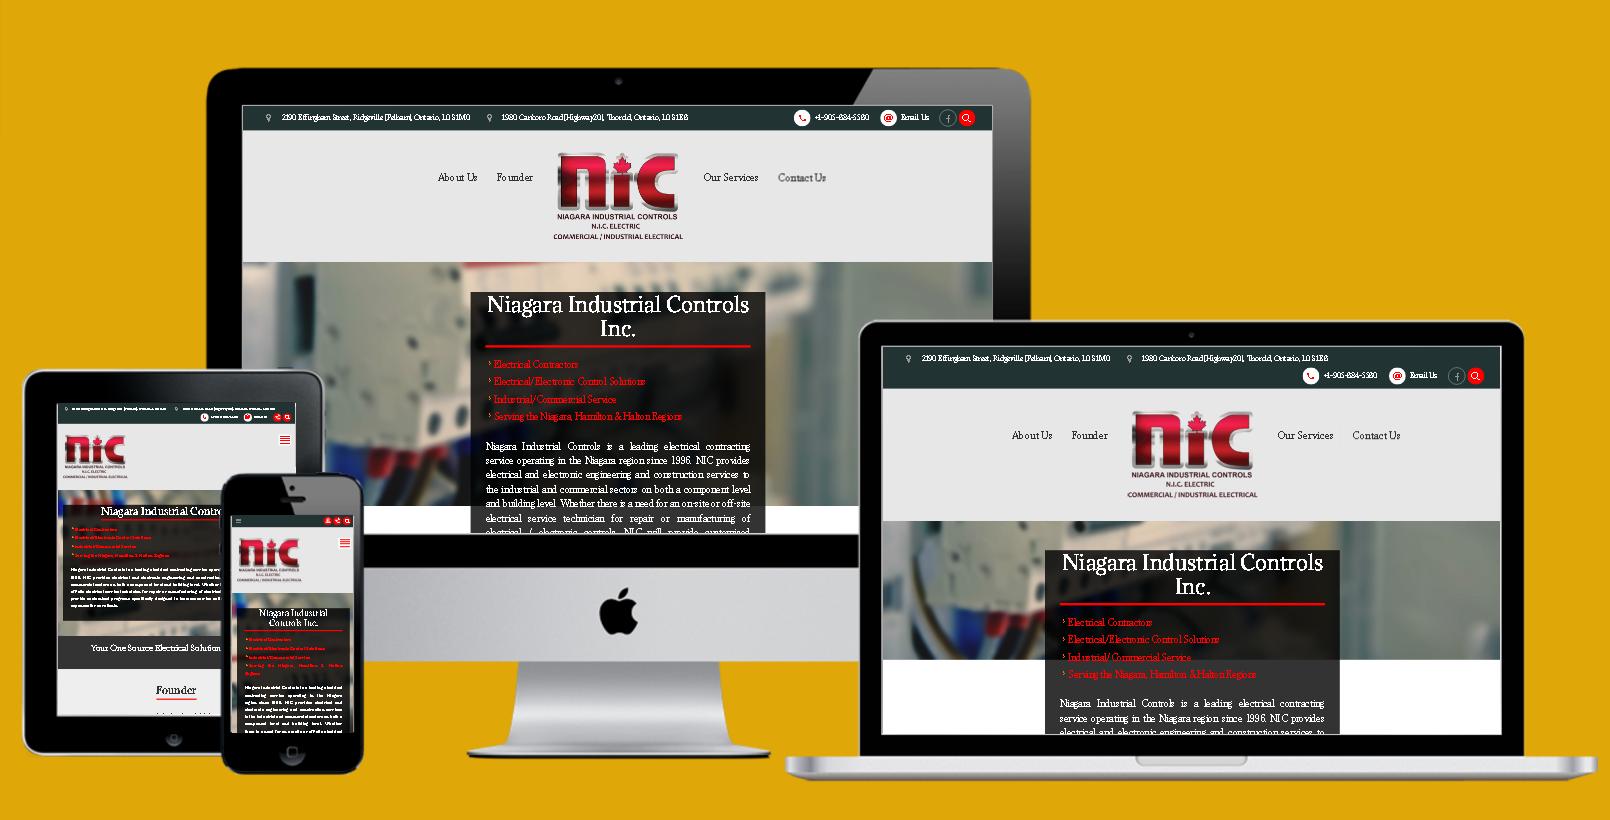 Niagara Industrial Controls Inc.